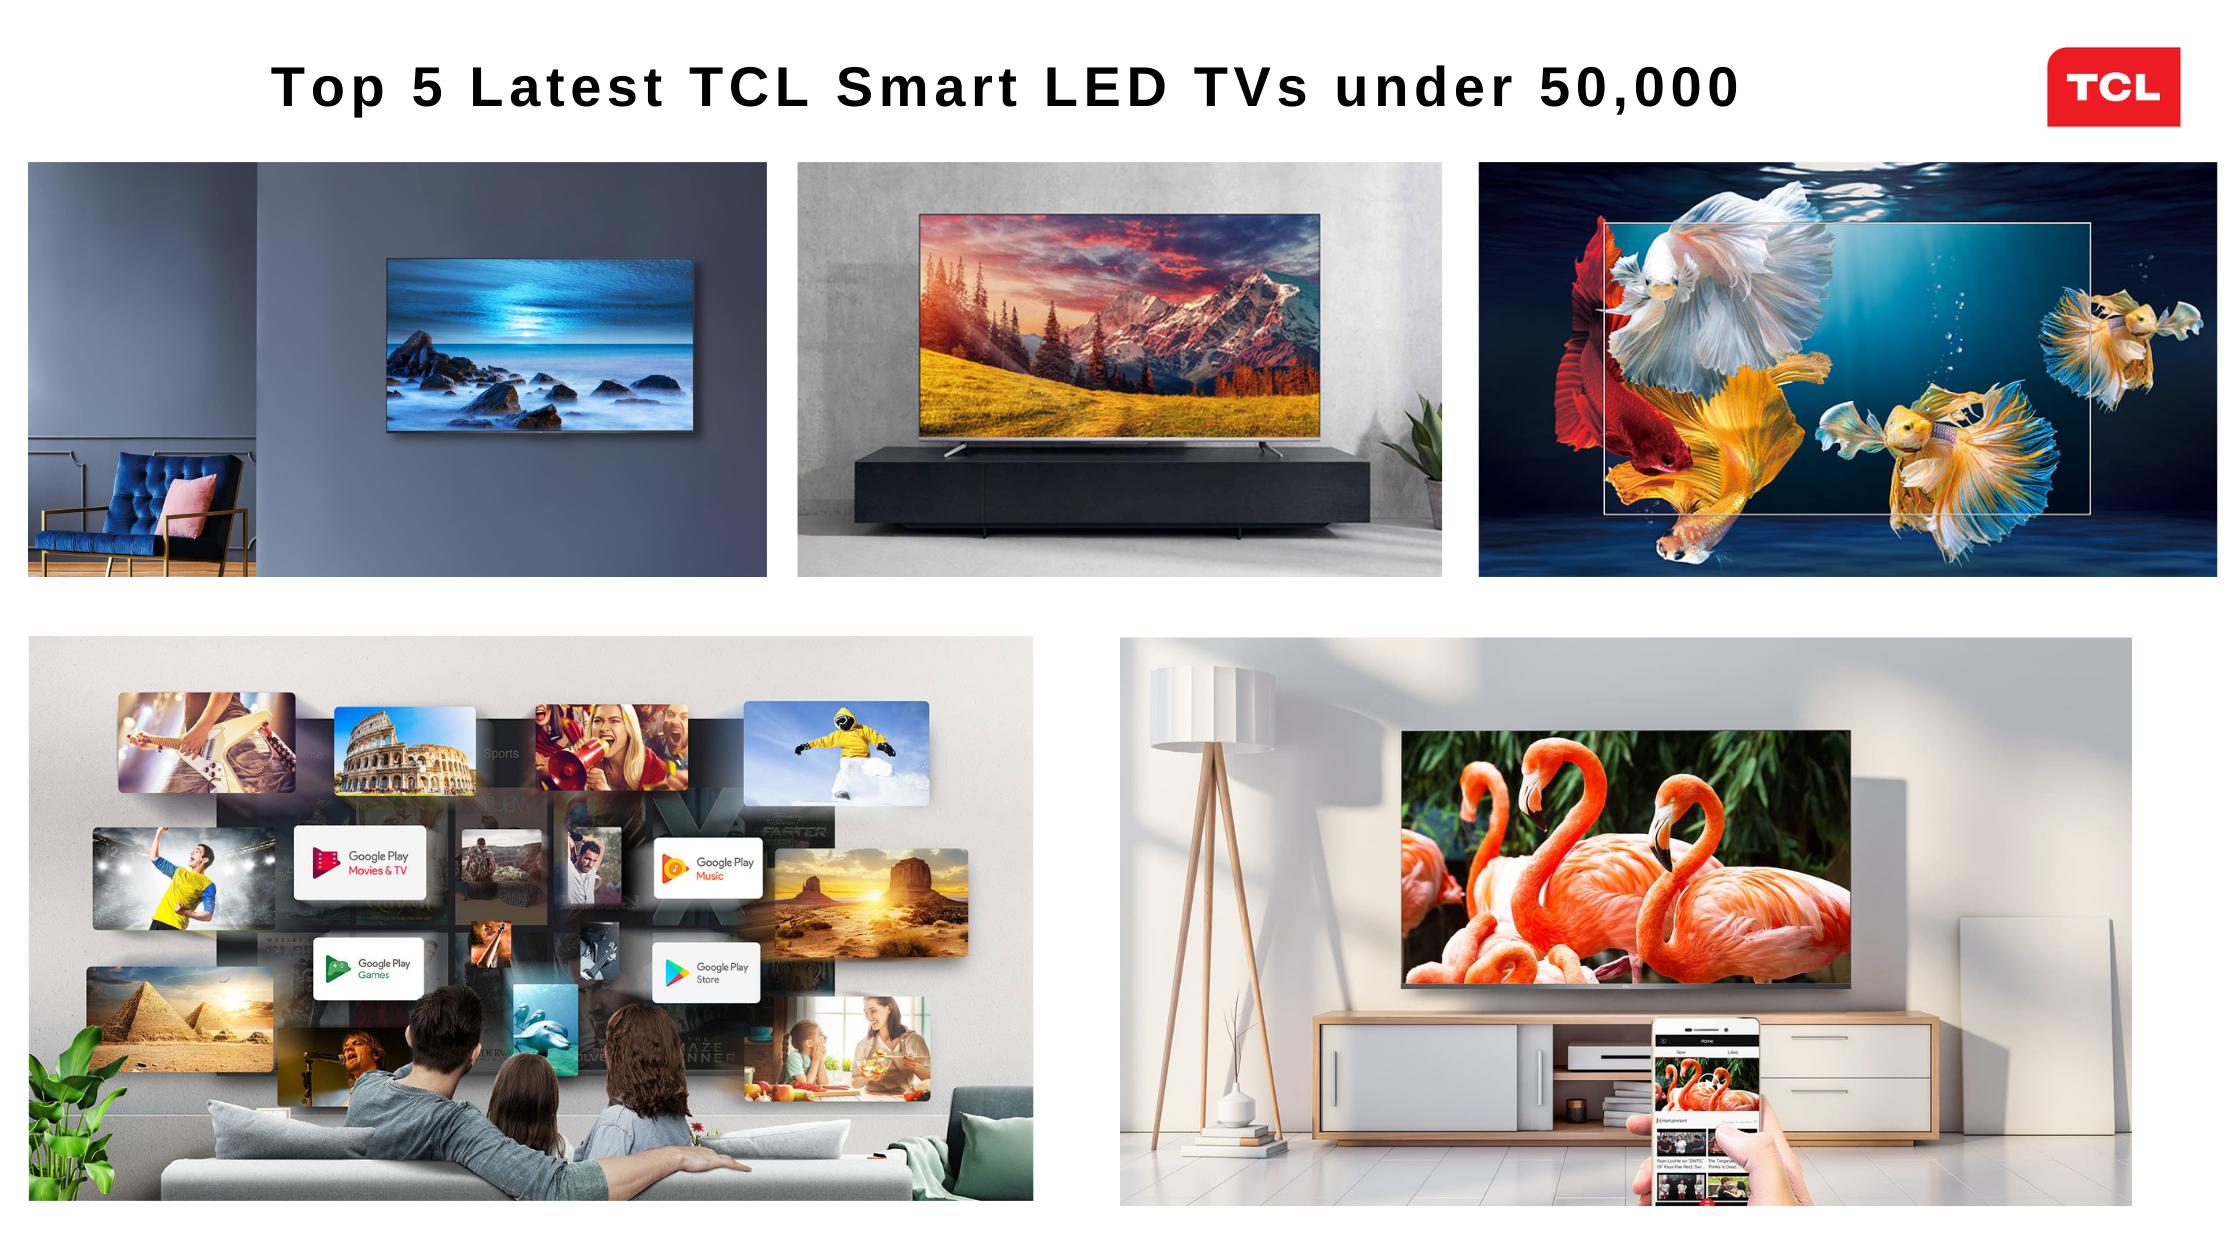 Top-5-latest-tcl-smart-led-tvs-under-50000